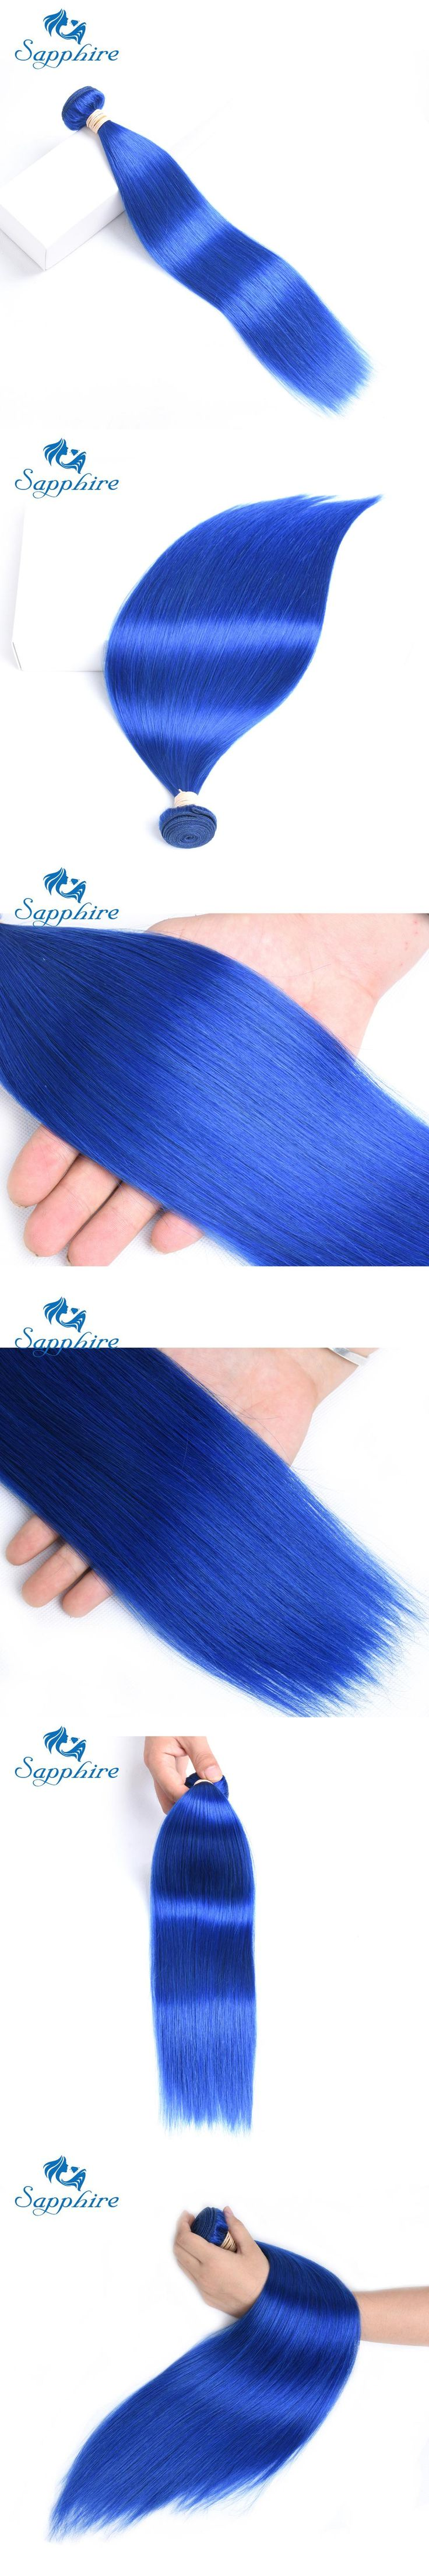 Sapphire Peruvian Straight Non-Remy Hair Weave 3 Bundles Blue Color Mixed Length Human Hair Bundles For Salon Hair 10-24Inch